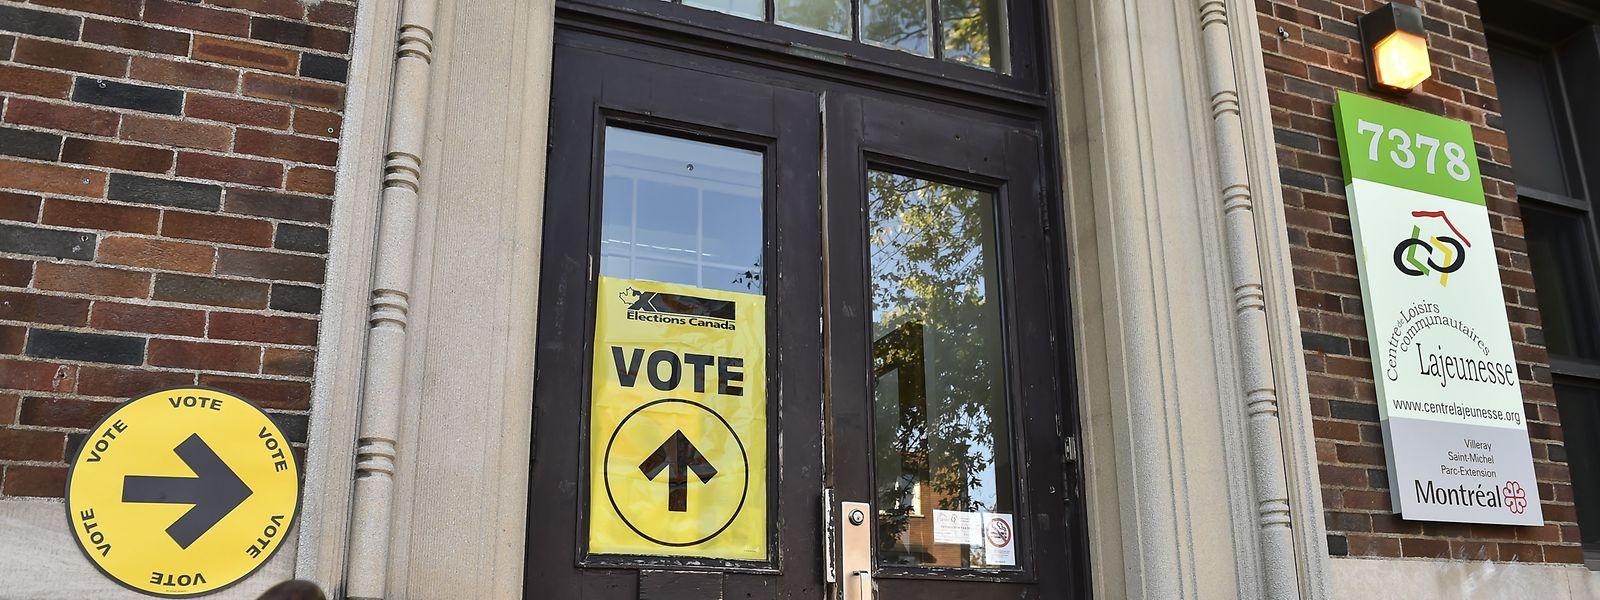 Eine Wahlstation in Montreal, Canada.